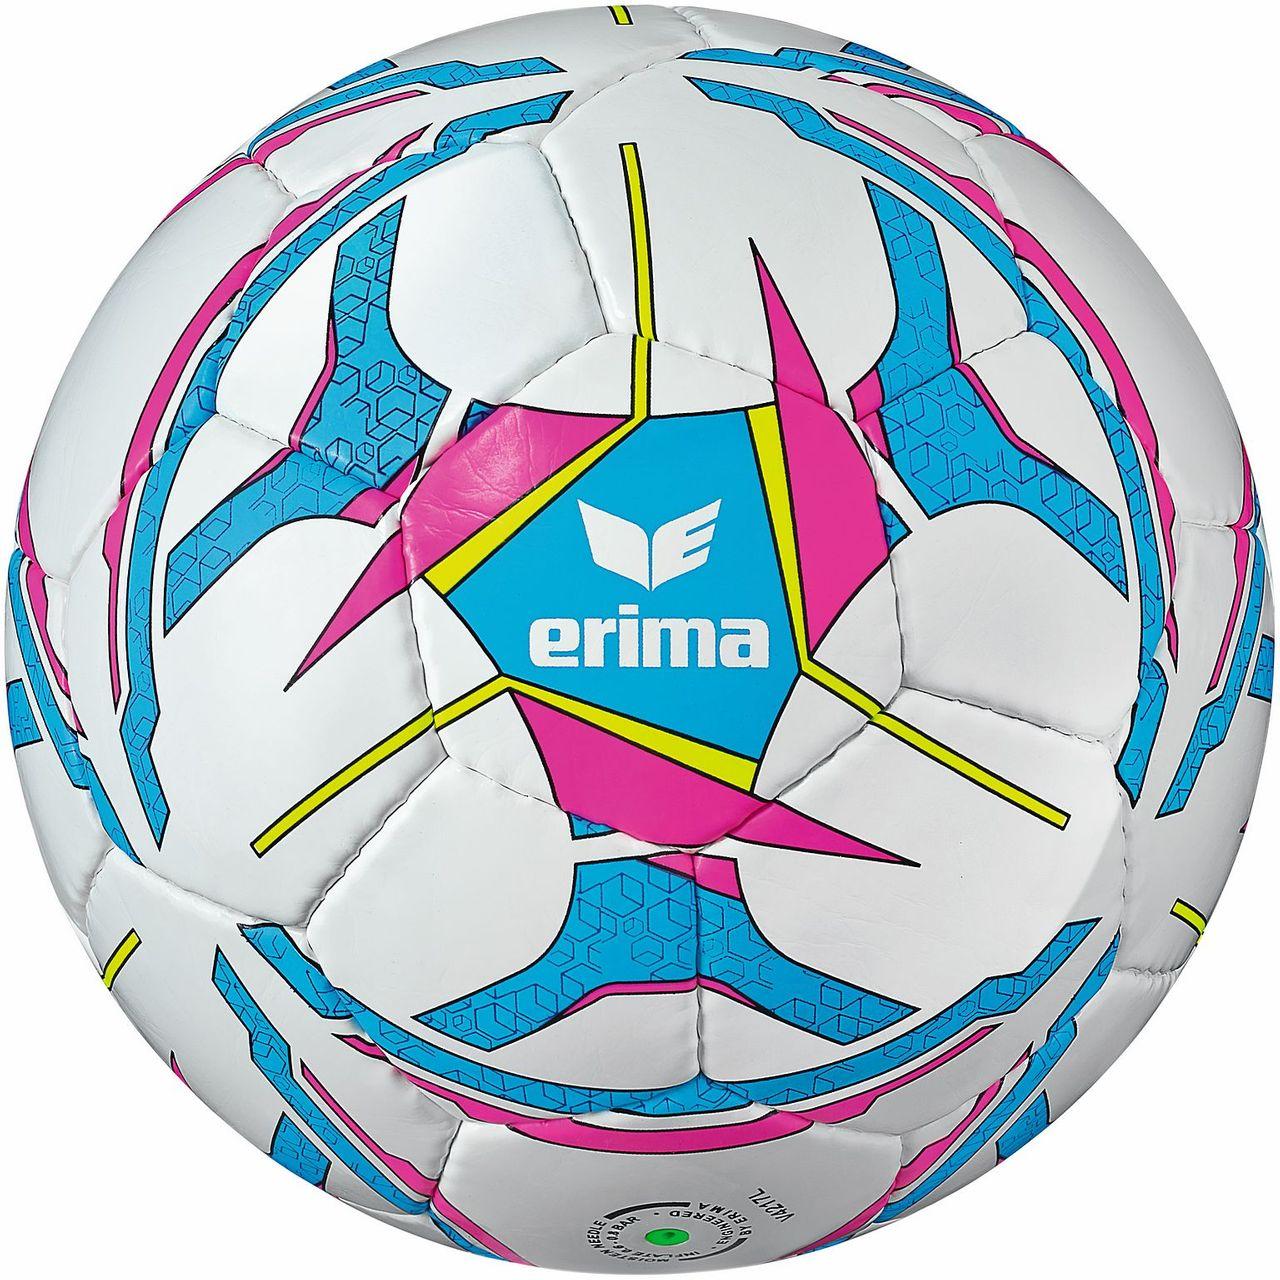 10 x erima Trainingsball Senzor Allround Training inkl. Ballsack